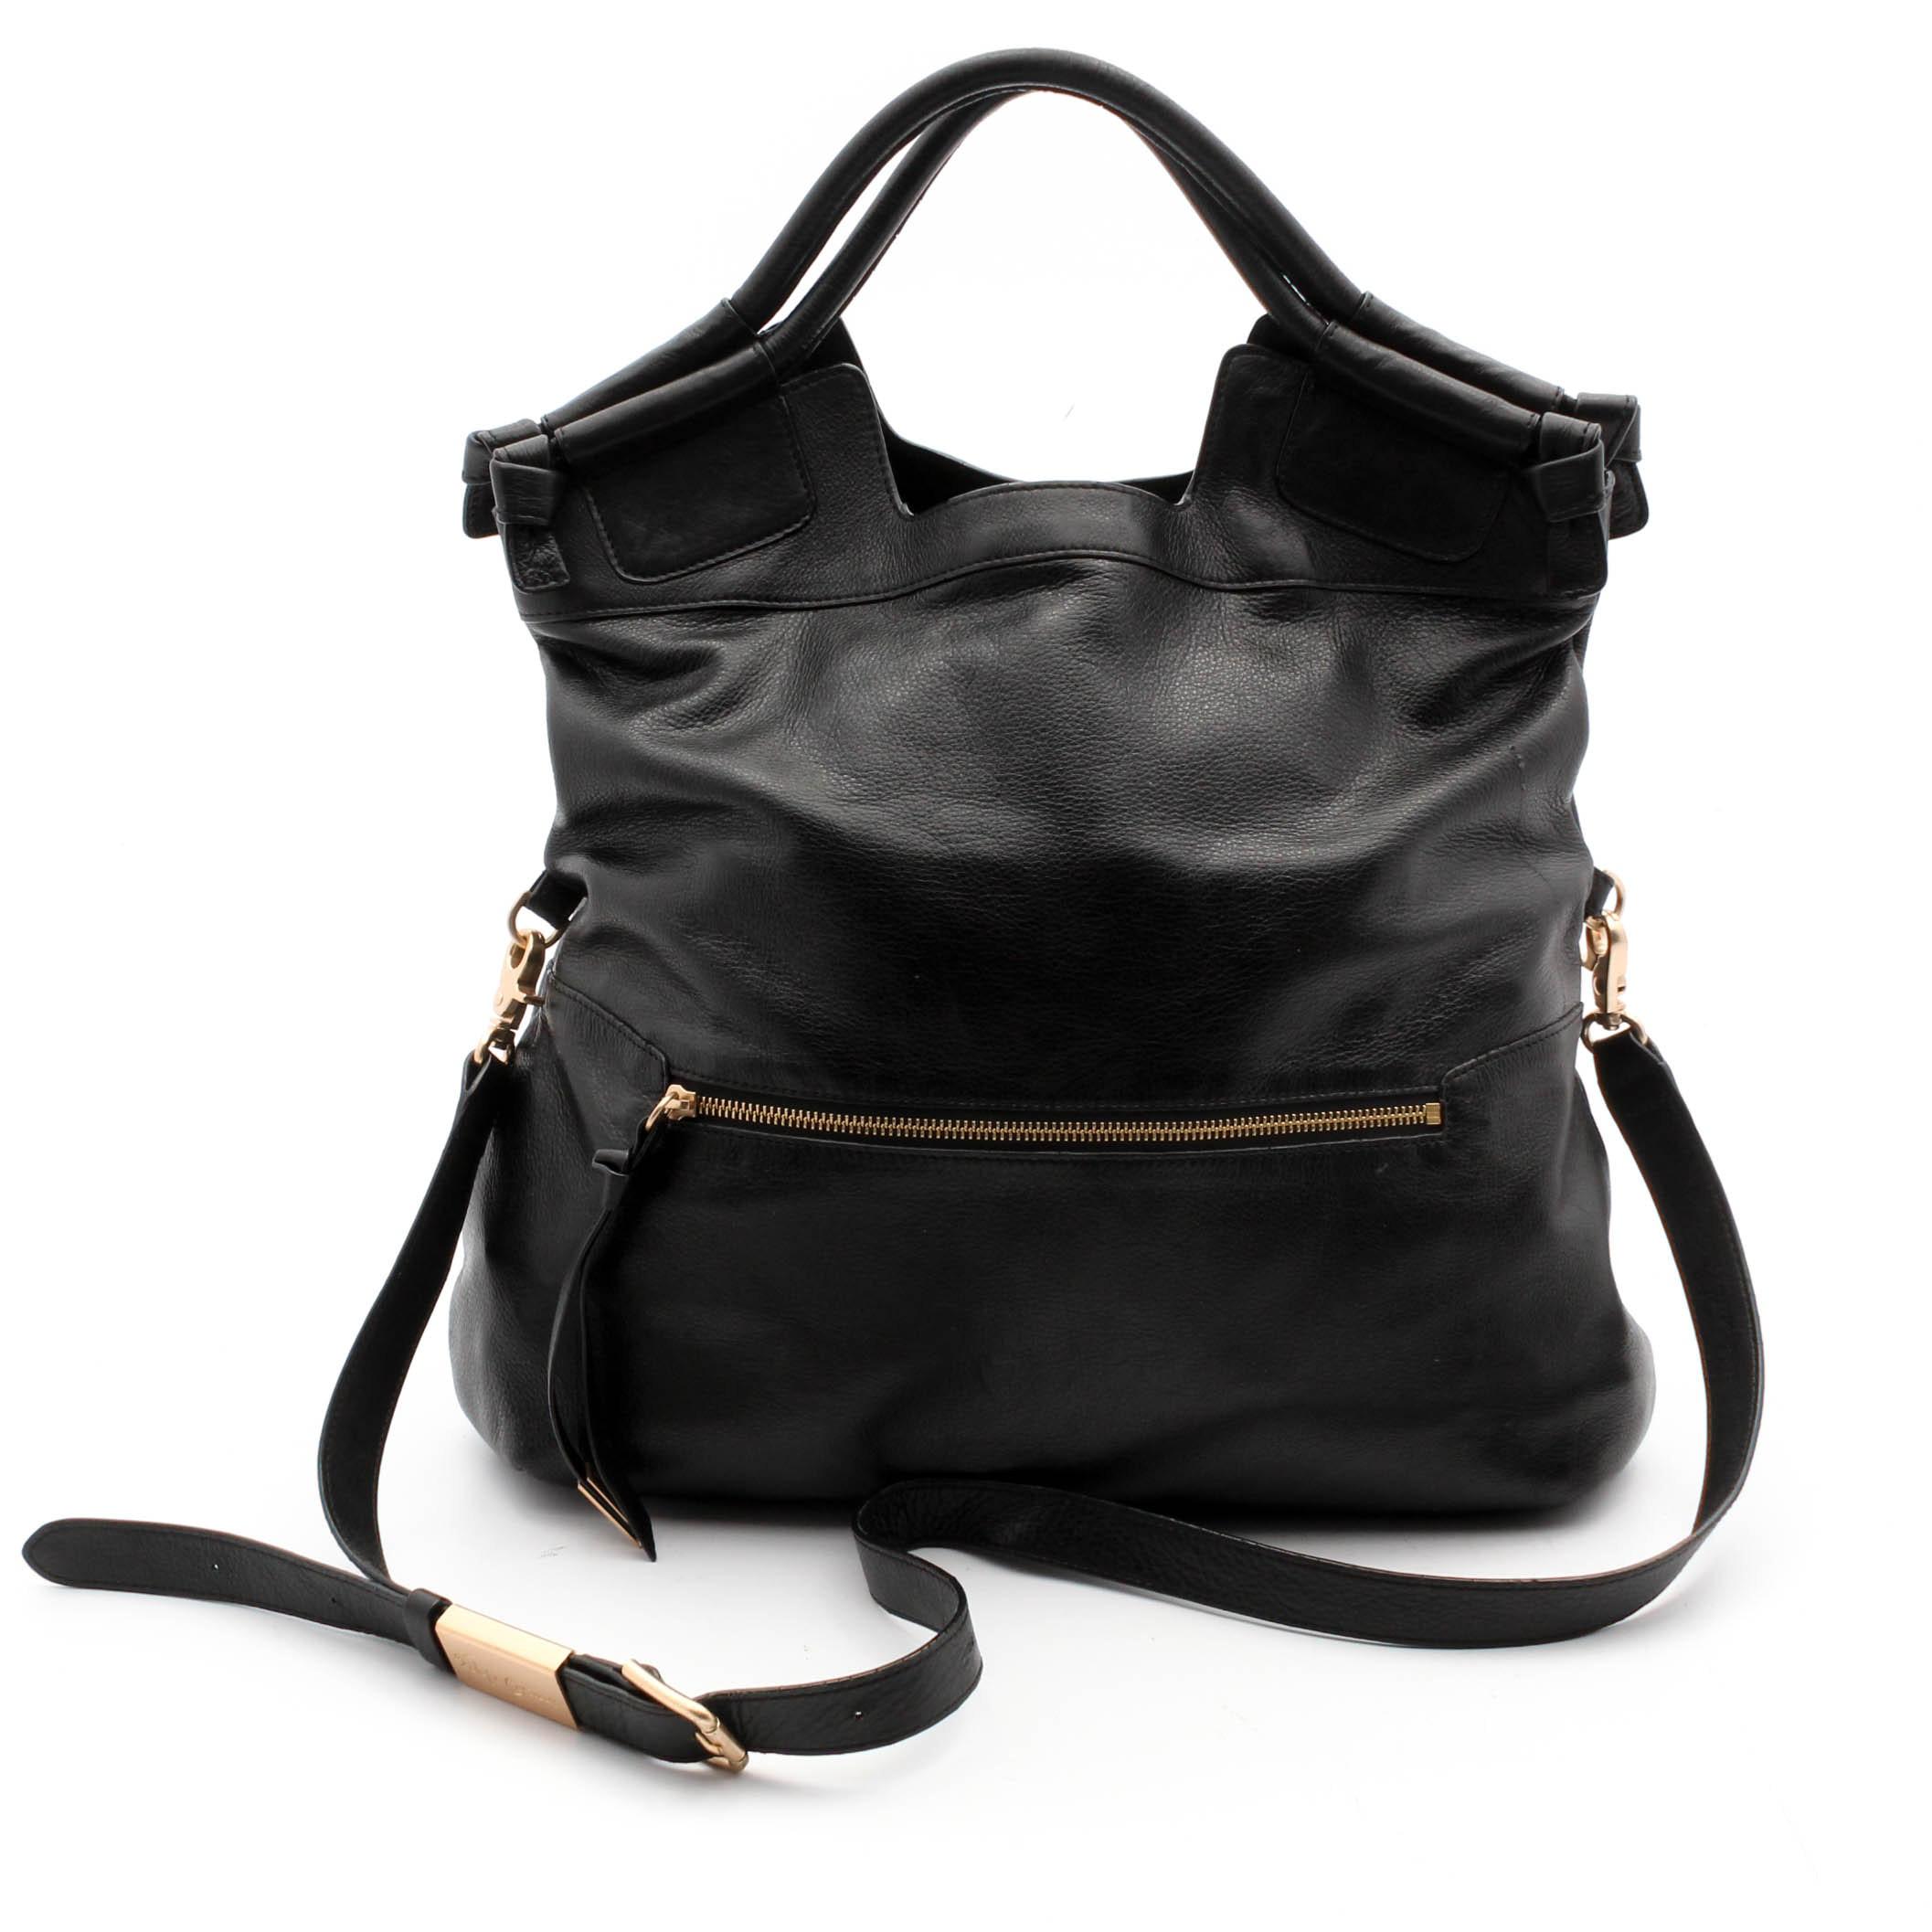 Foley & Corinna Black Leather Bag